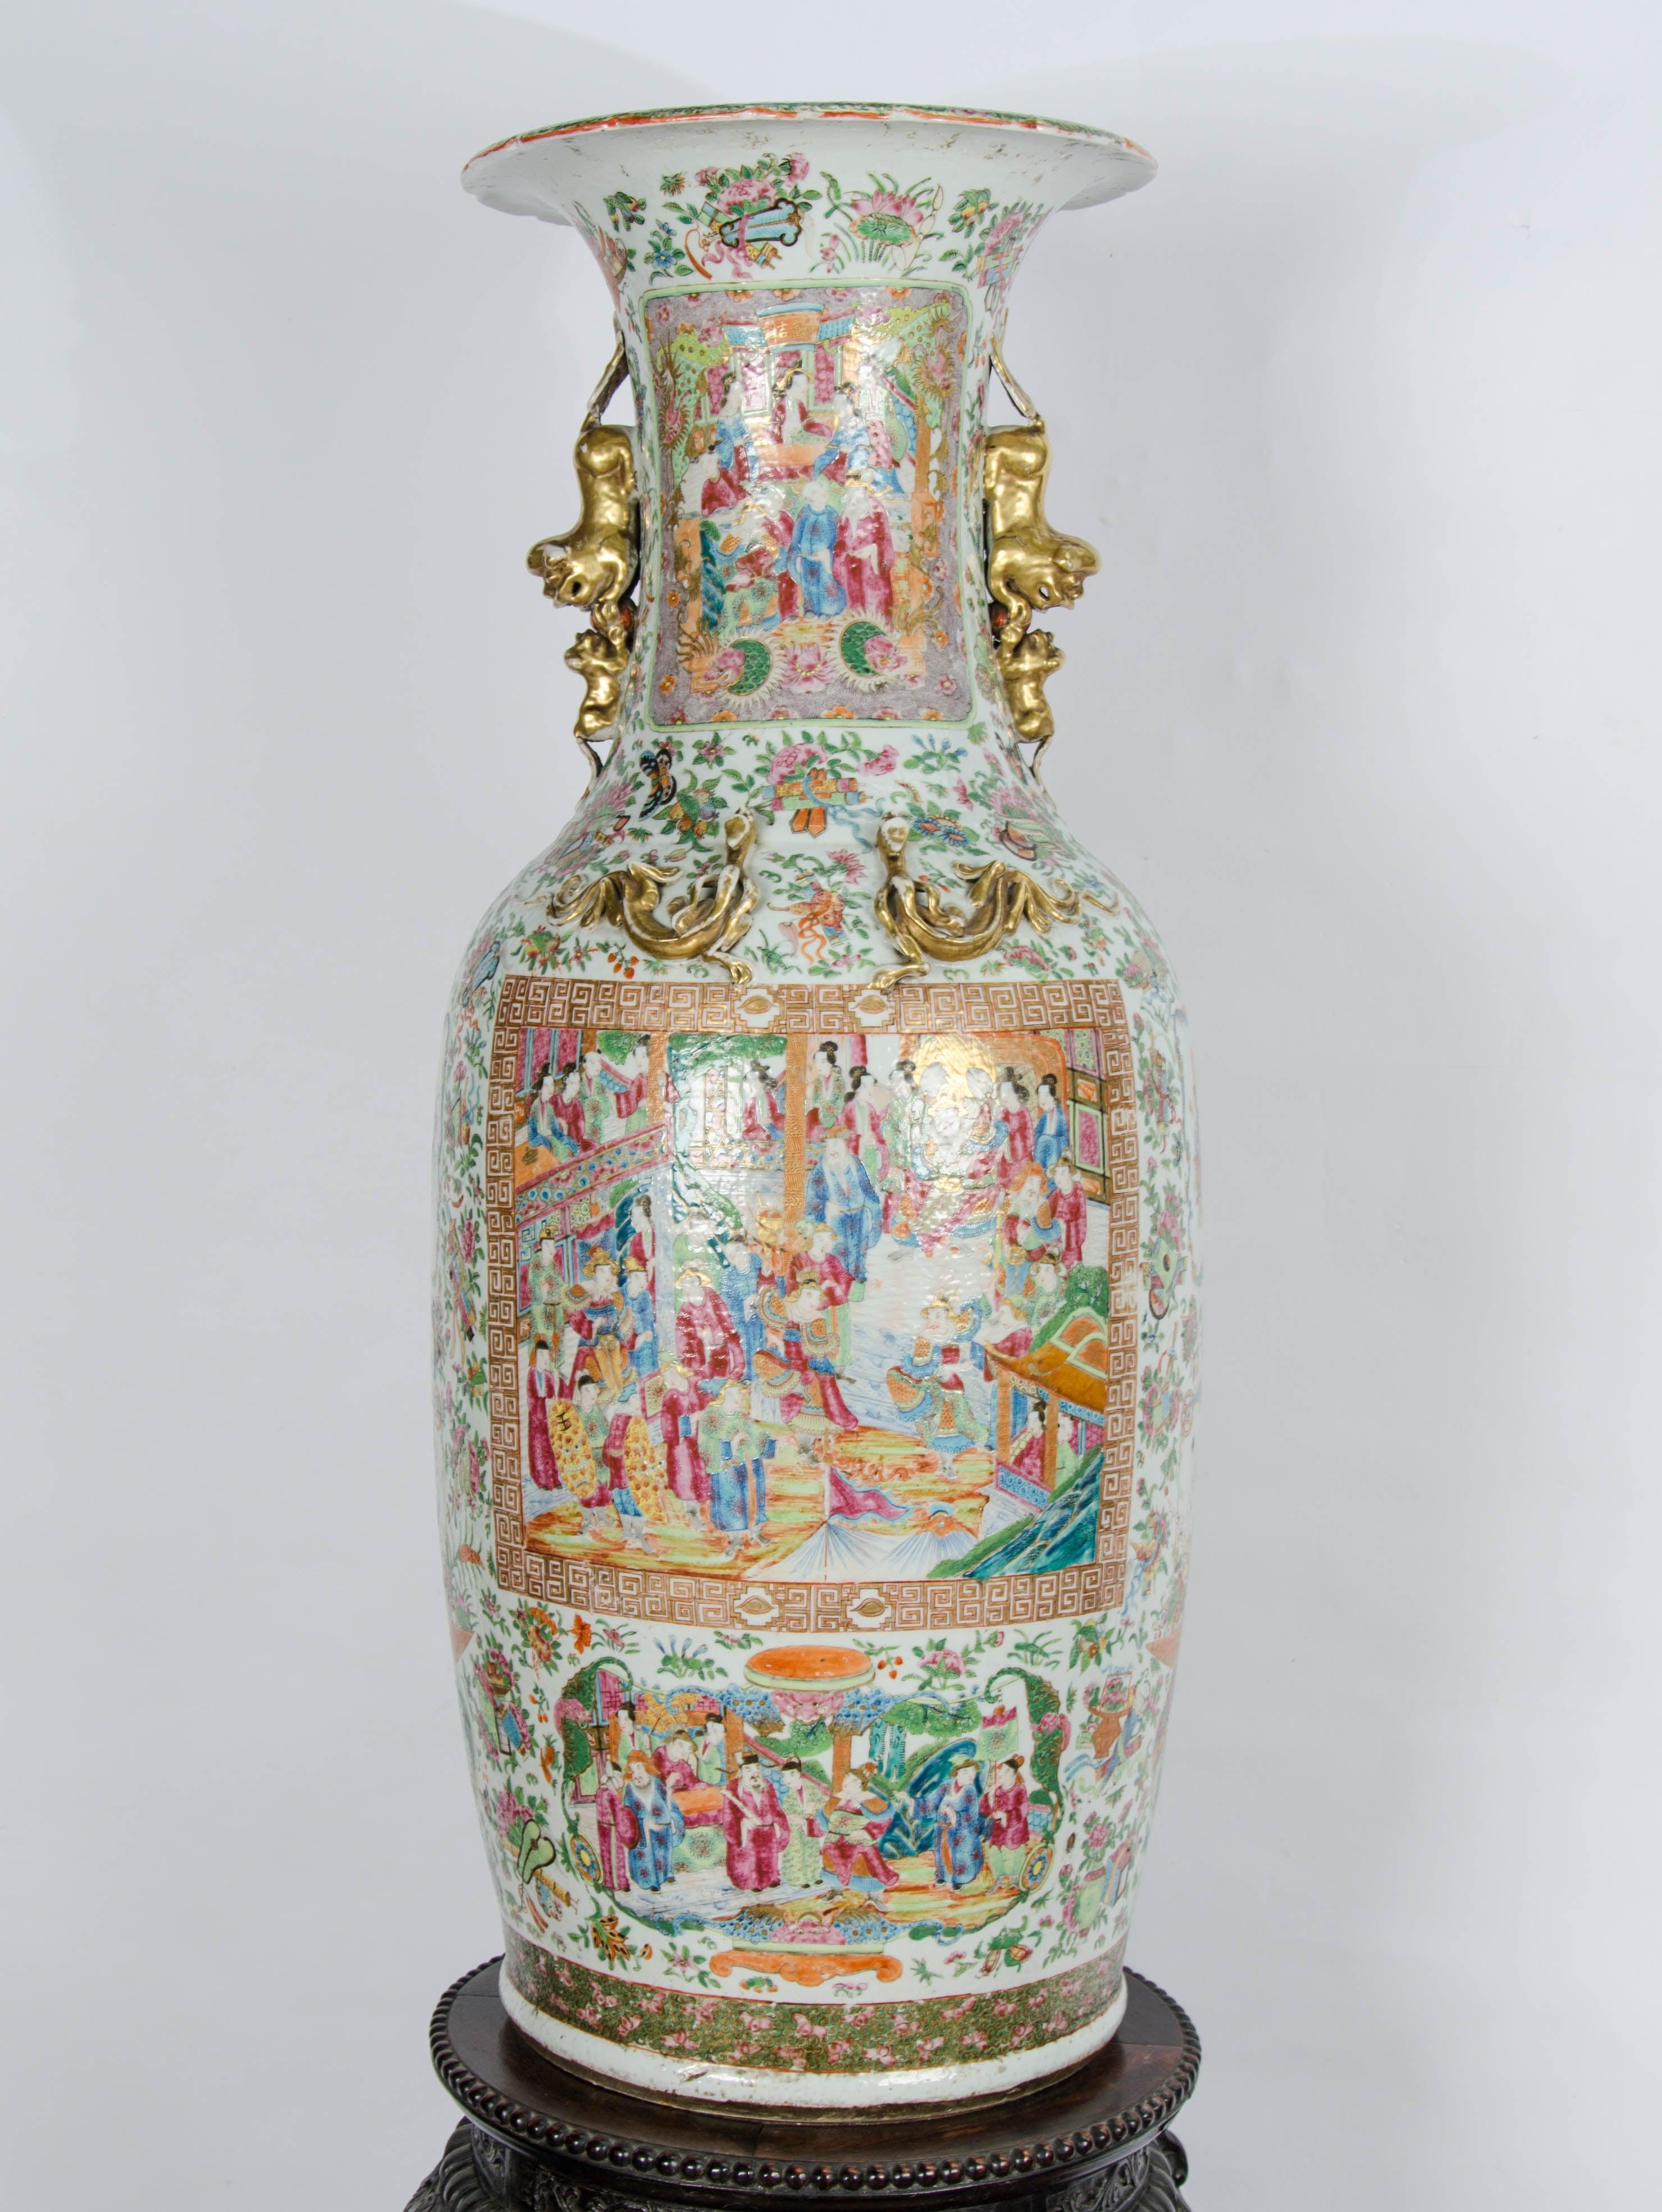 Large 19th Century Chinese Rose Medallion Vase on Stand